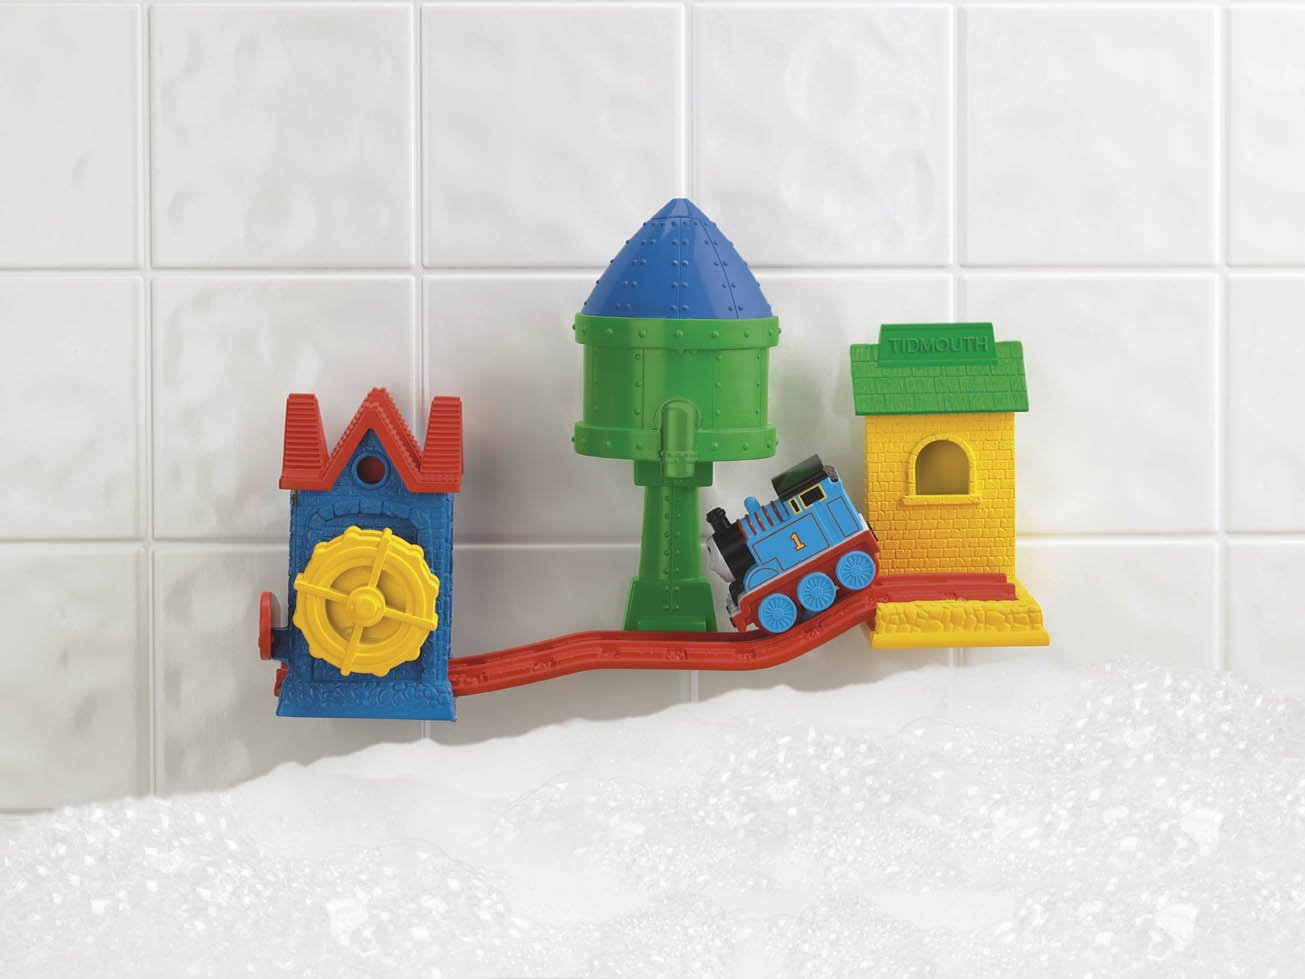 Amazon.com: Thomas the Tank Engine Train & Friends Sodor ... |Thomas The Train Toys Bath Time